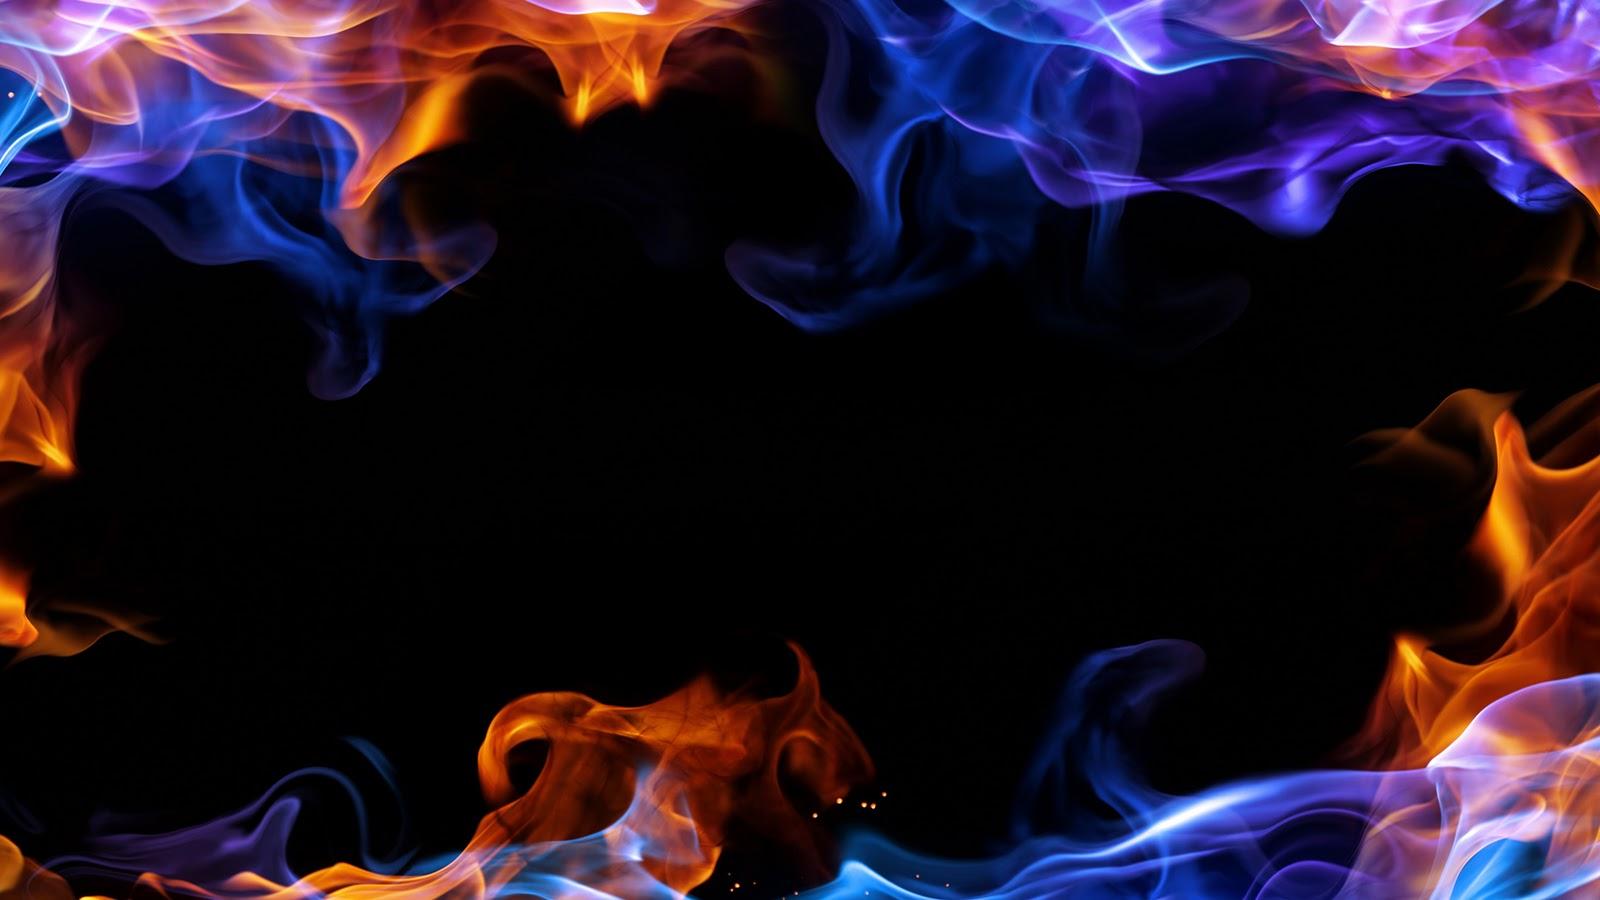 Wonderful Wallpaper Music Fire - fire-wallpaper-mobile  Pictures_43999.jpg